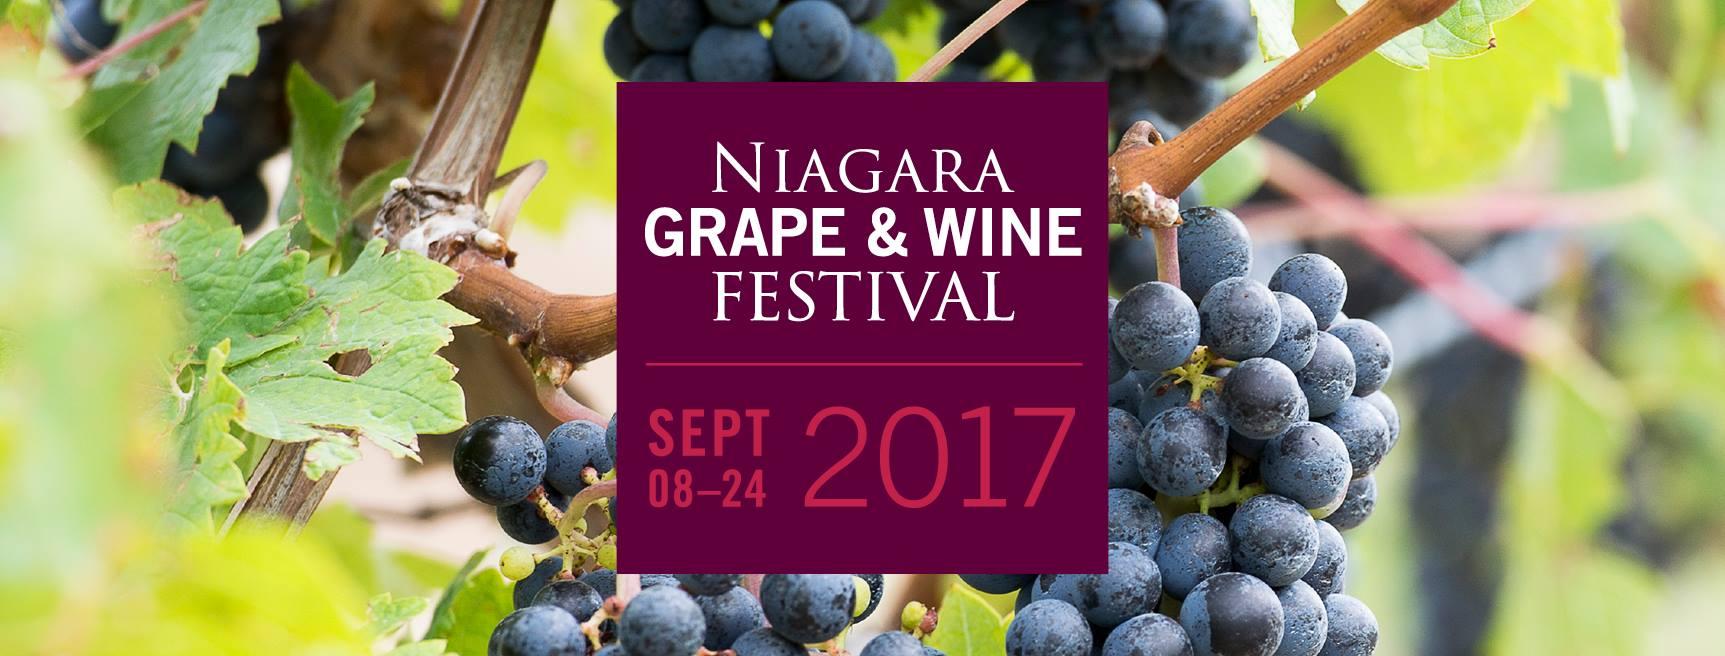 Niagara Grape and Wine Festival VIP Packs